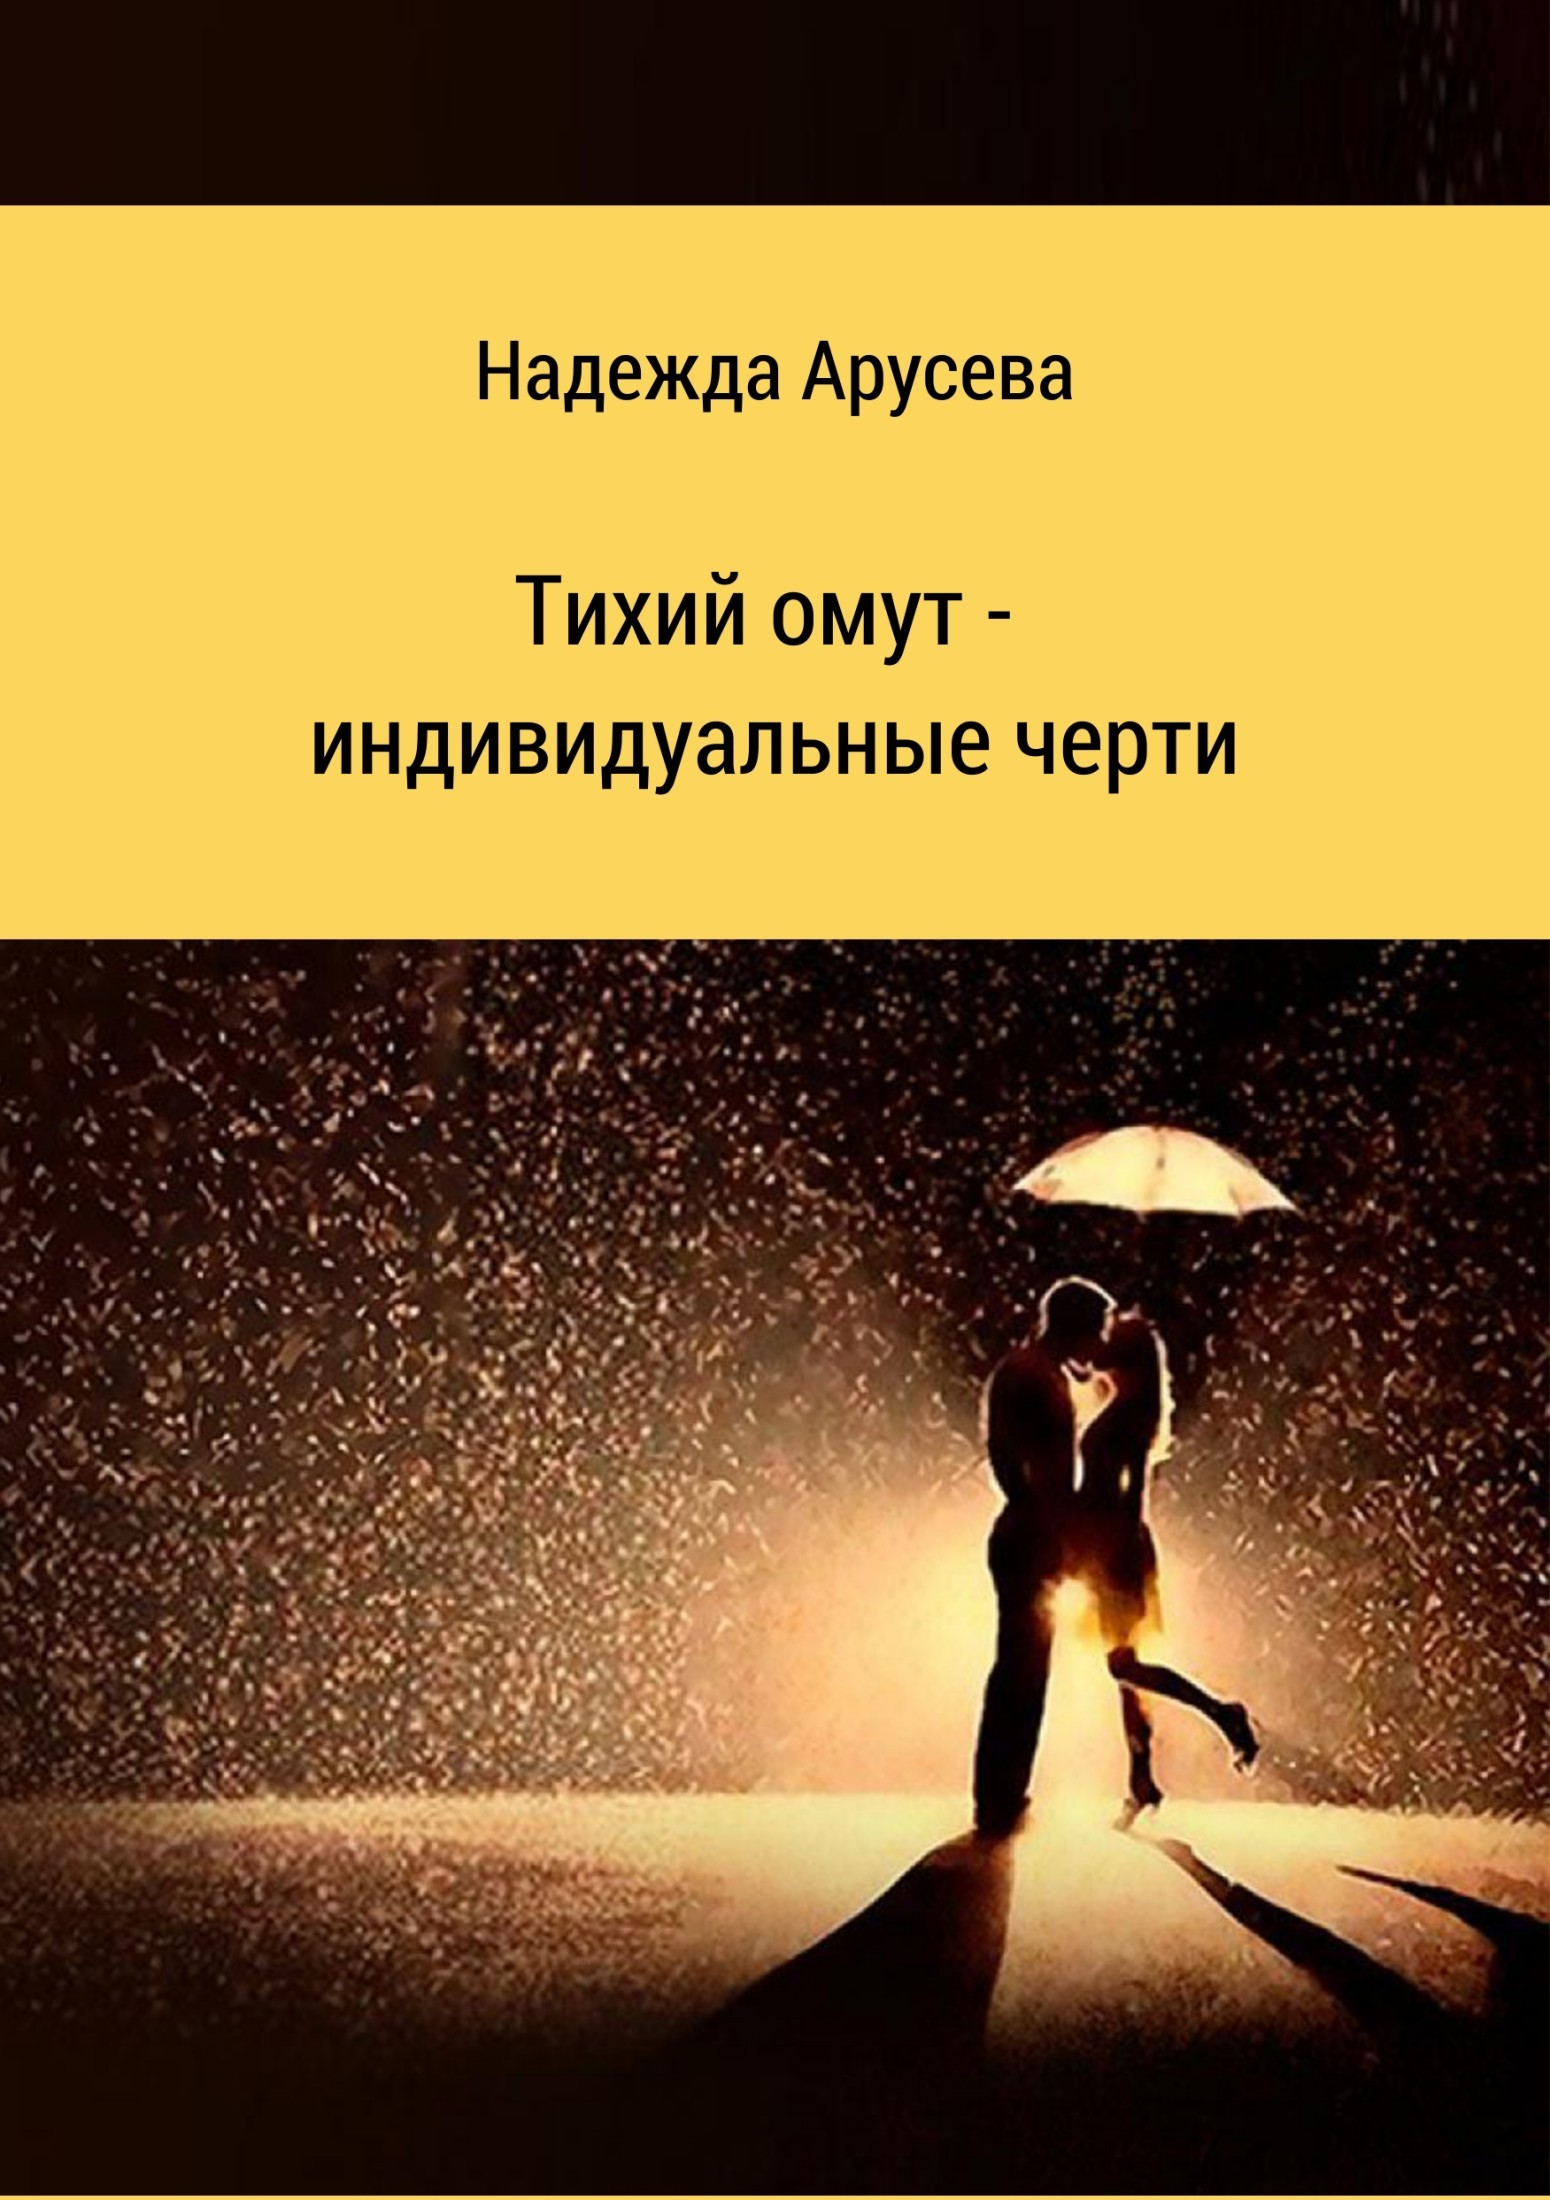 Надежда Ивановна Арусева бесплатно